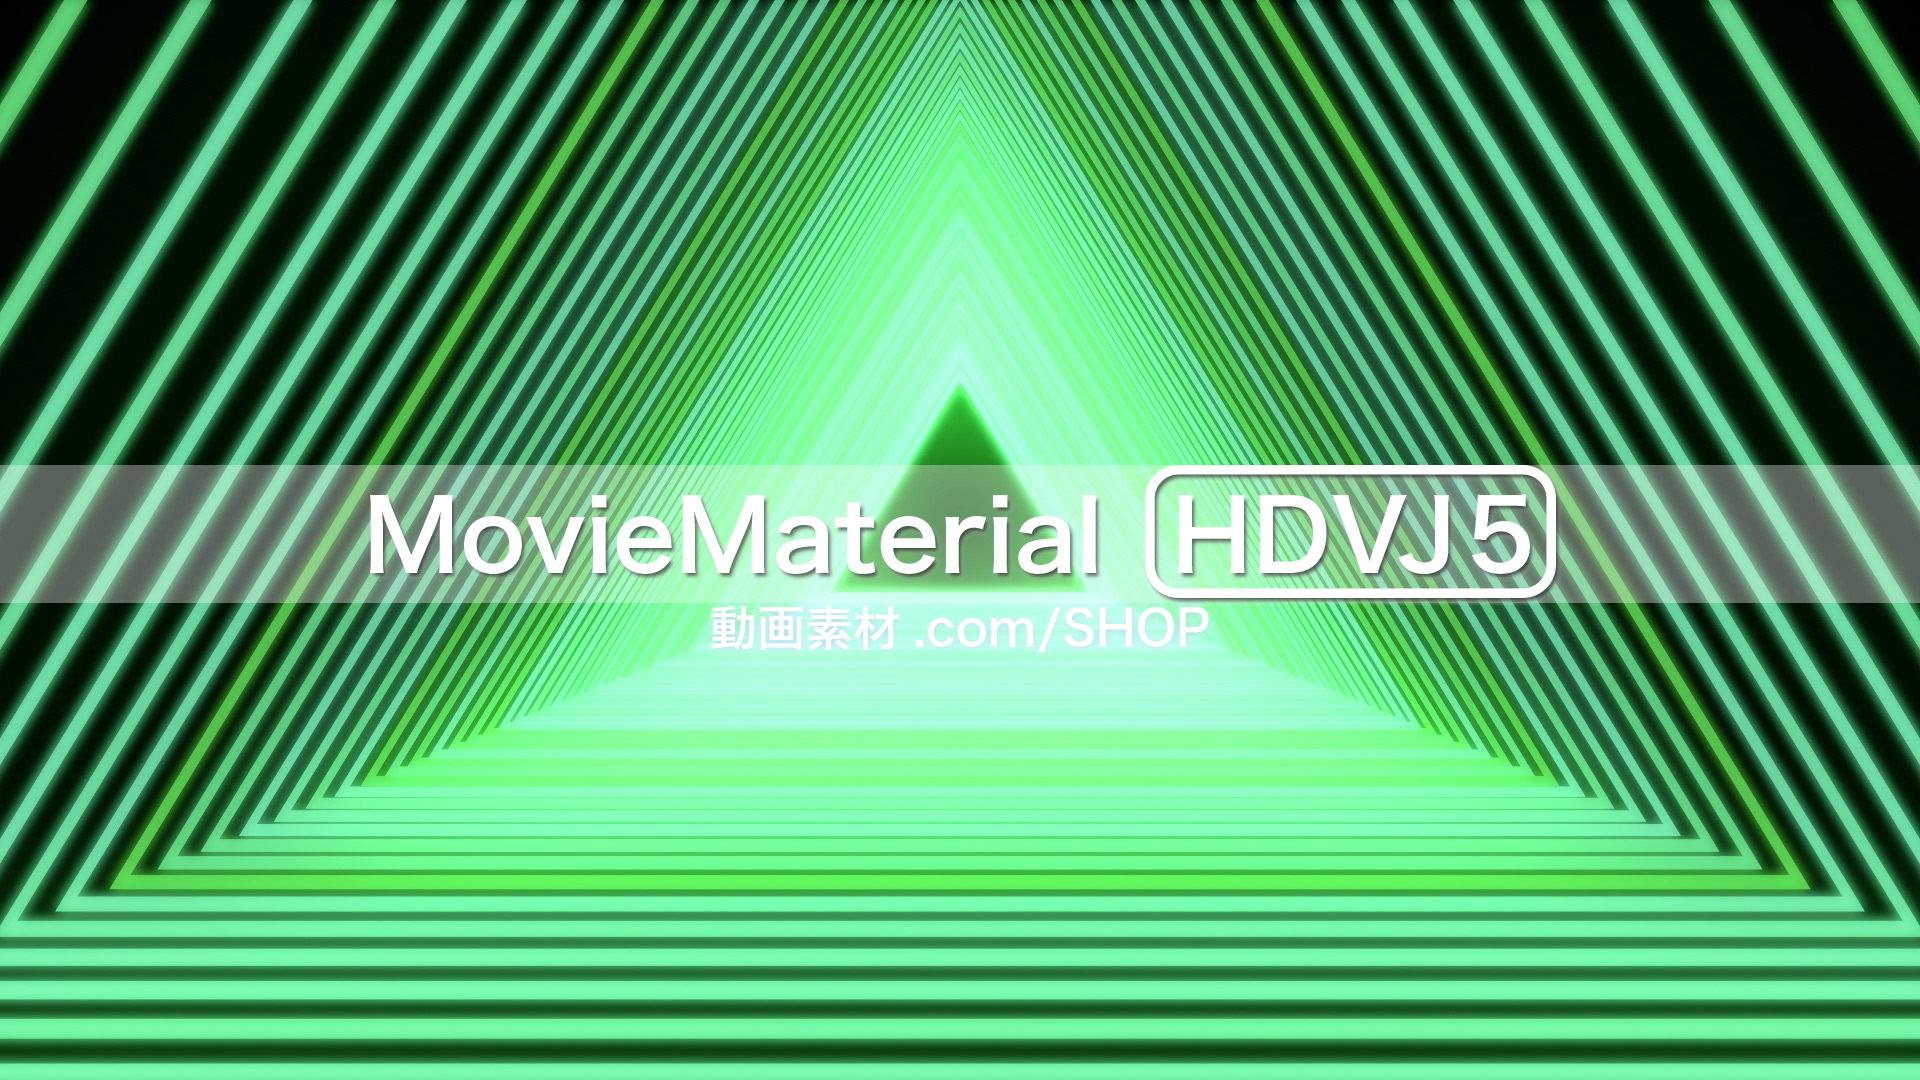 MovieMaterial HDVJ5 フルハイビジョンVJ動画素材集 画像4